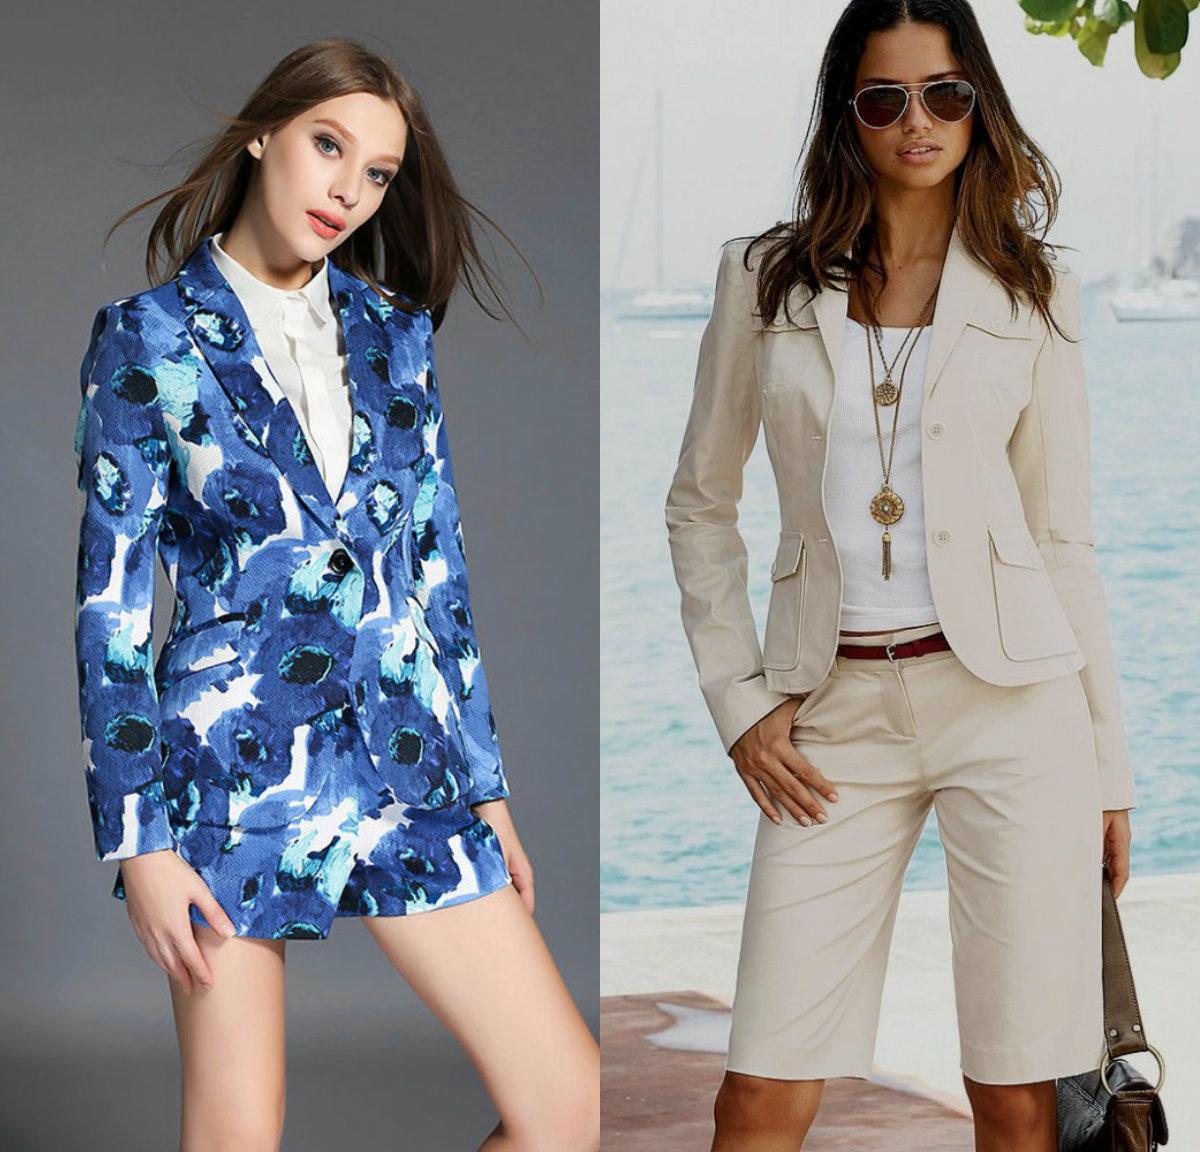 Женские костюмы 2018 : модели шортами